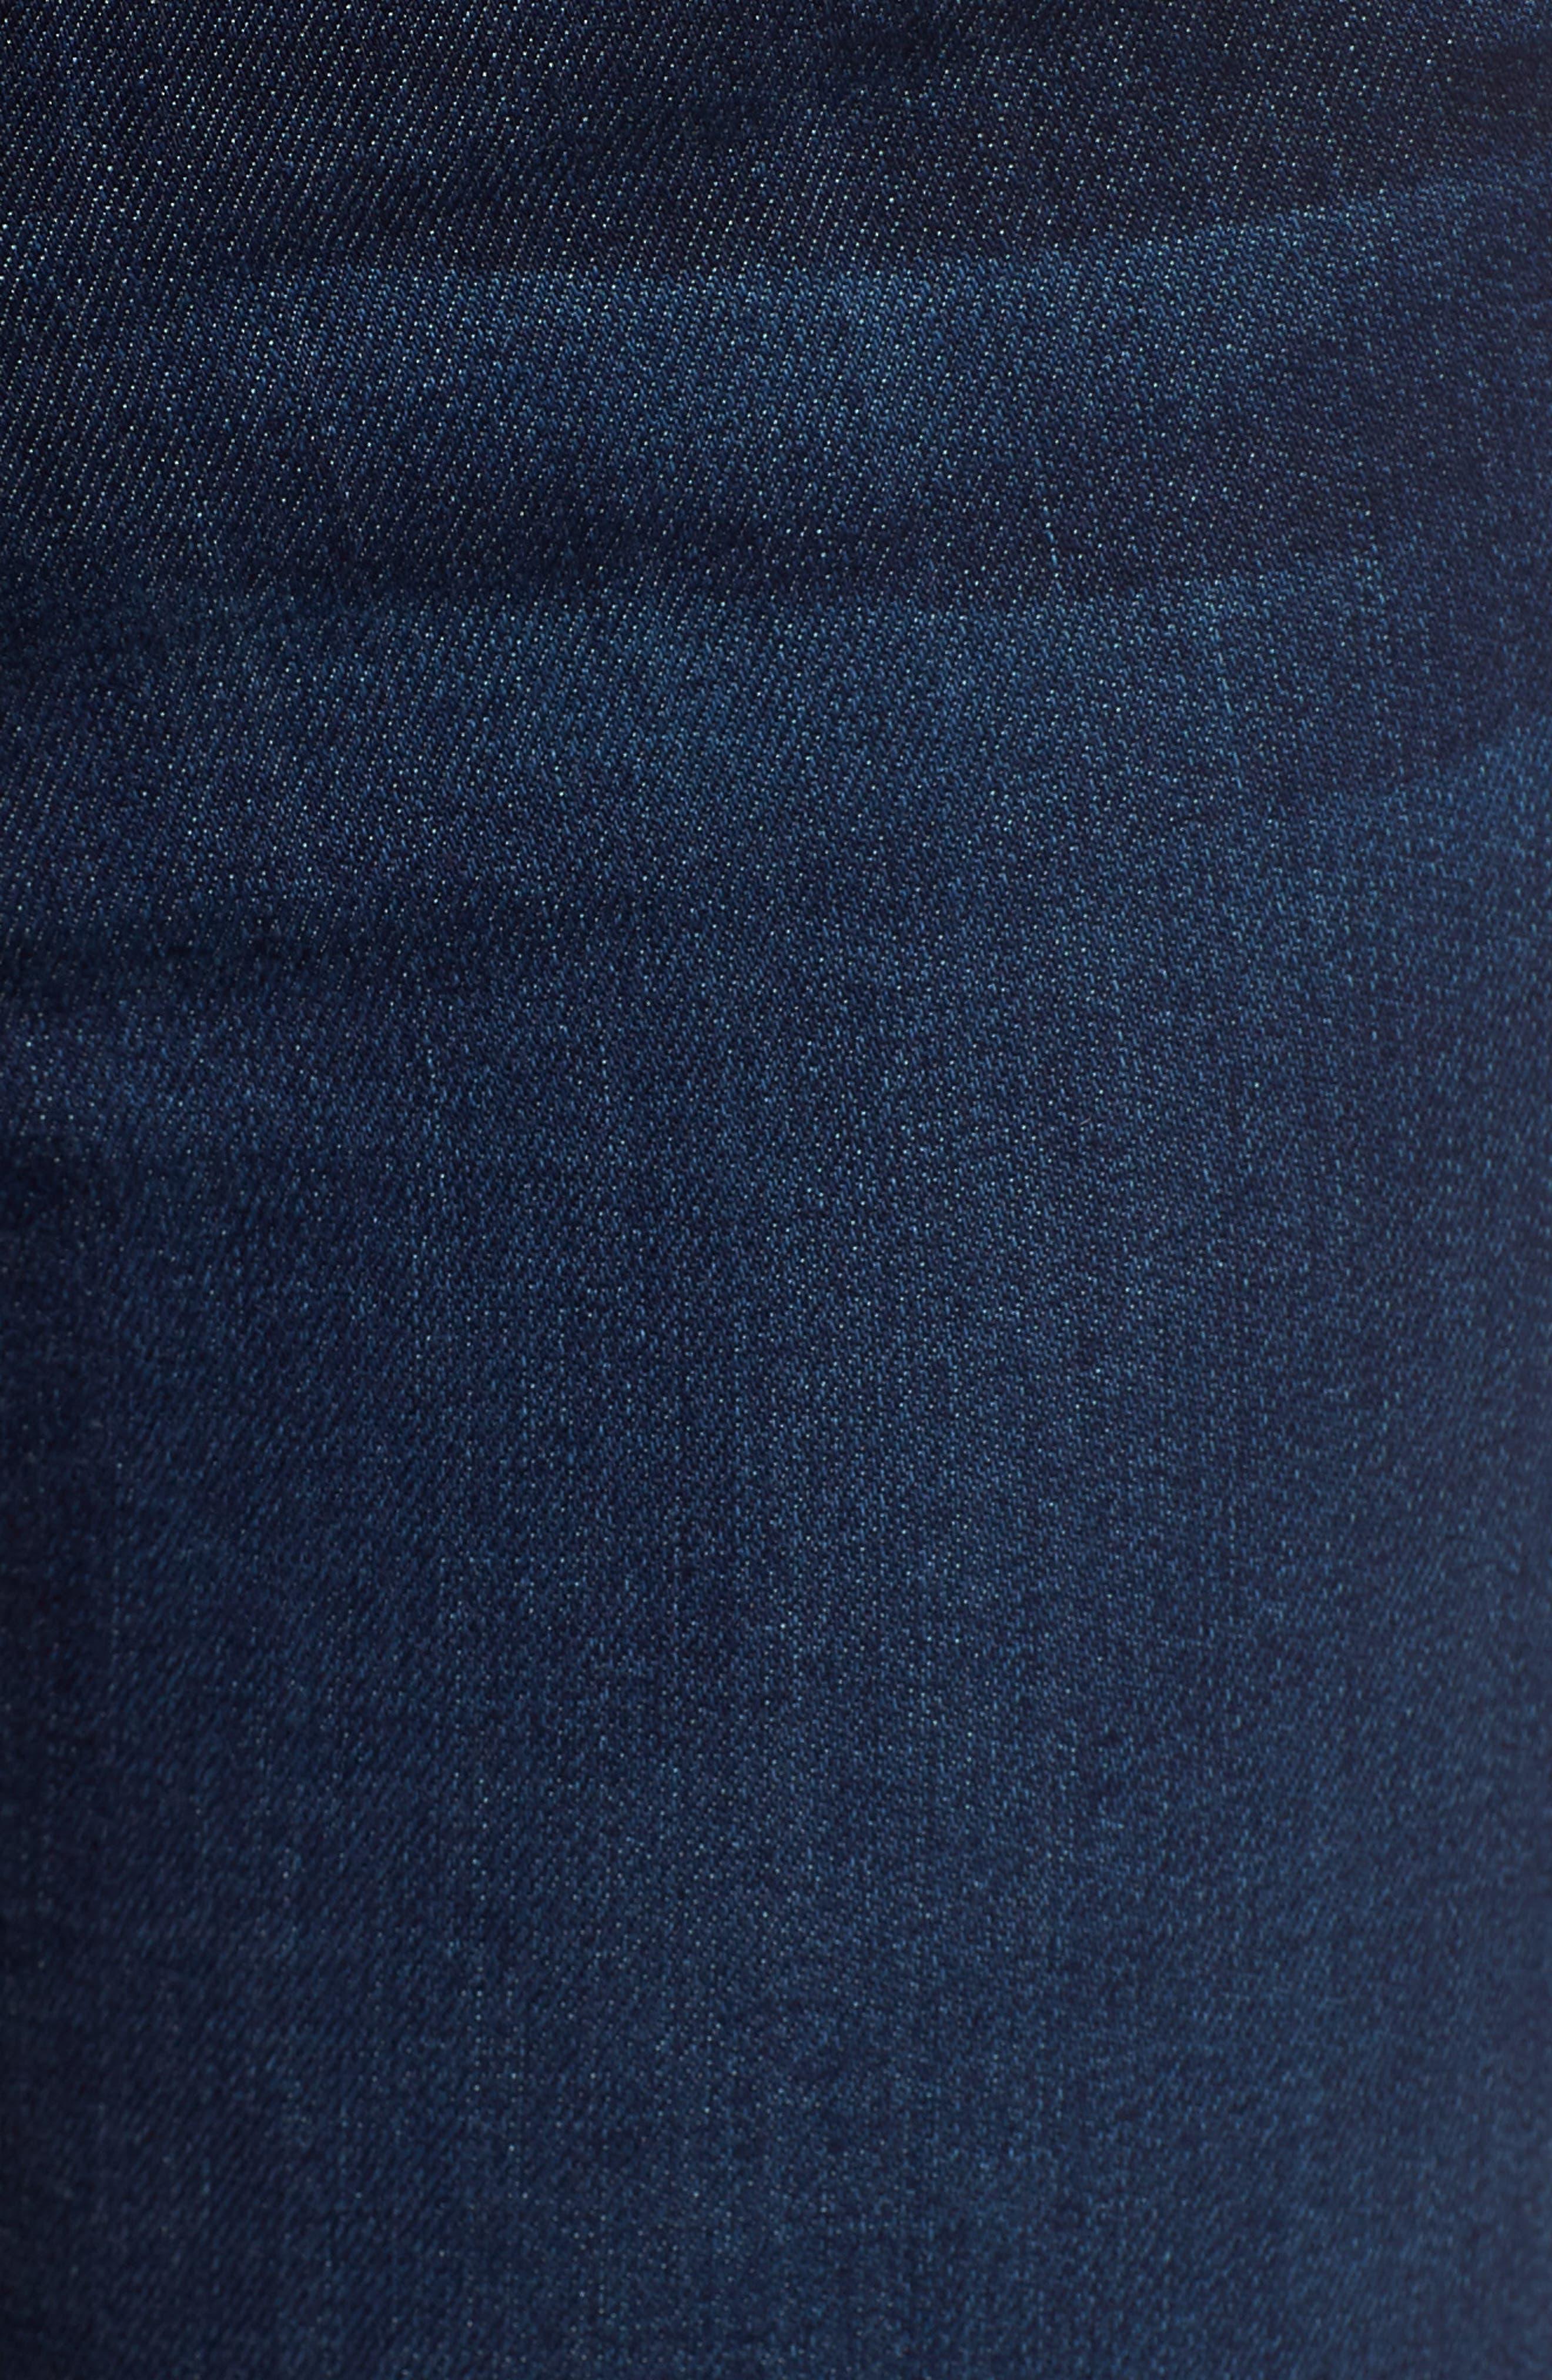 High Waist Cutoff Skinny Jeans,                             Alternate thumbnail 6, color,                             400